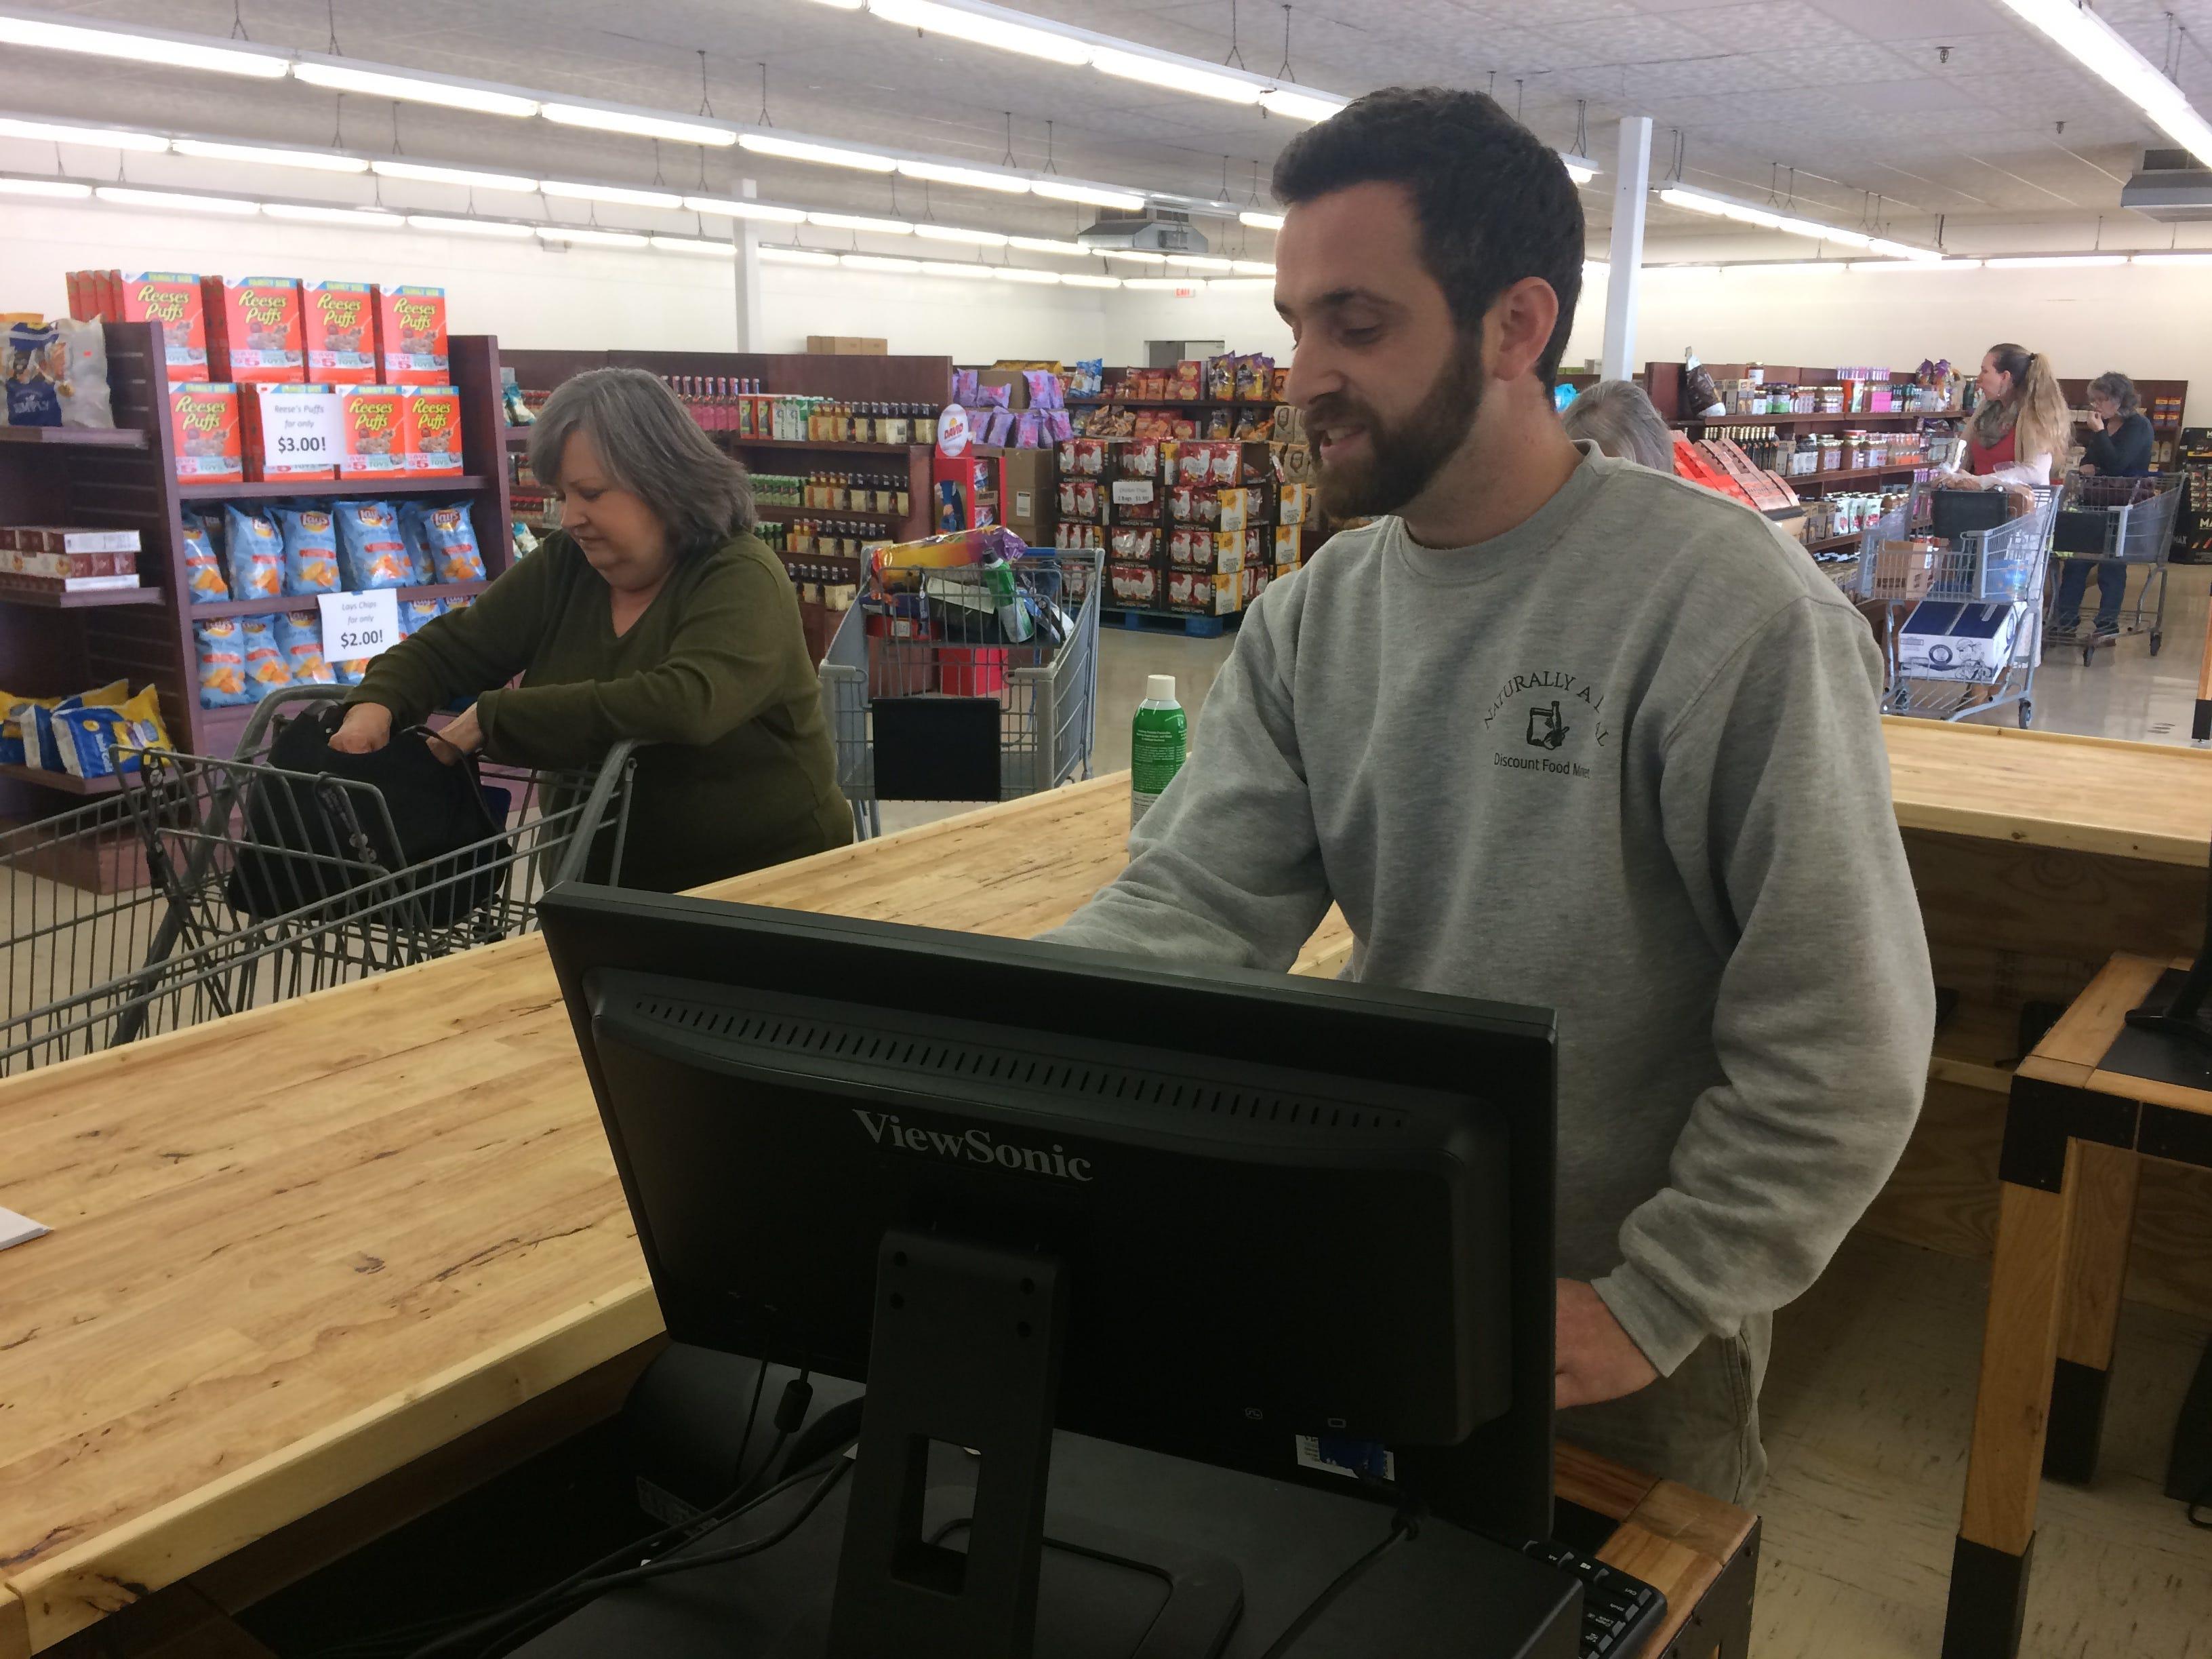 Jon Einwechter, owner of Naturally a Deal, handles the register while Kathy Schaffer of Powell checks out.